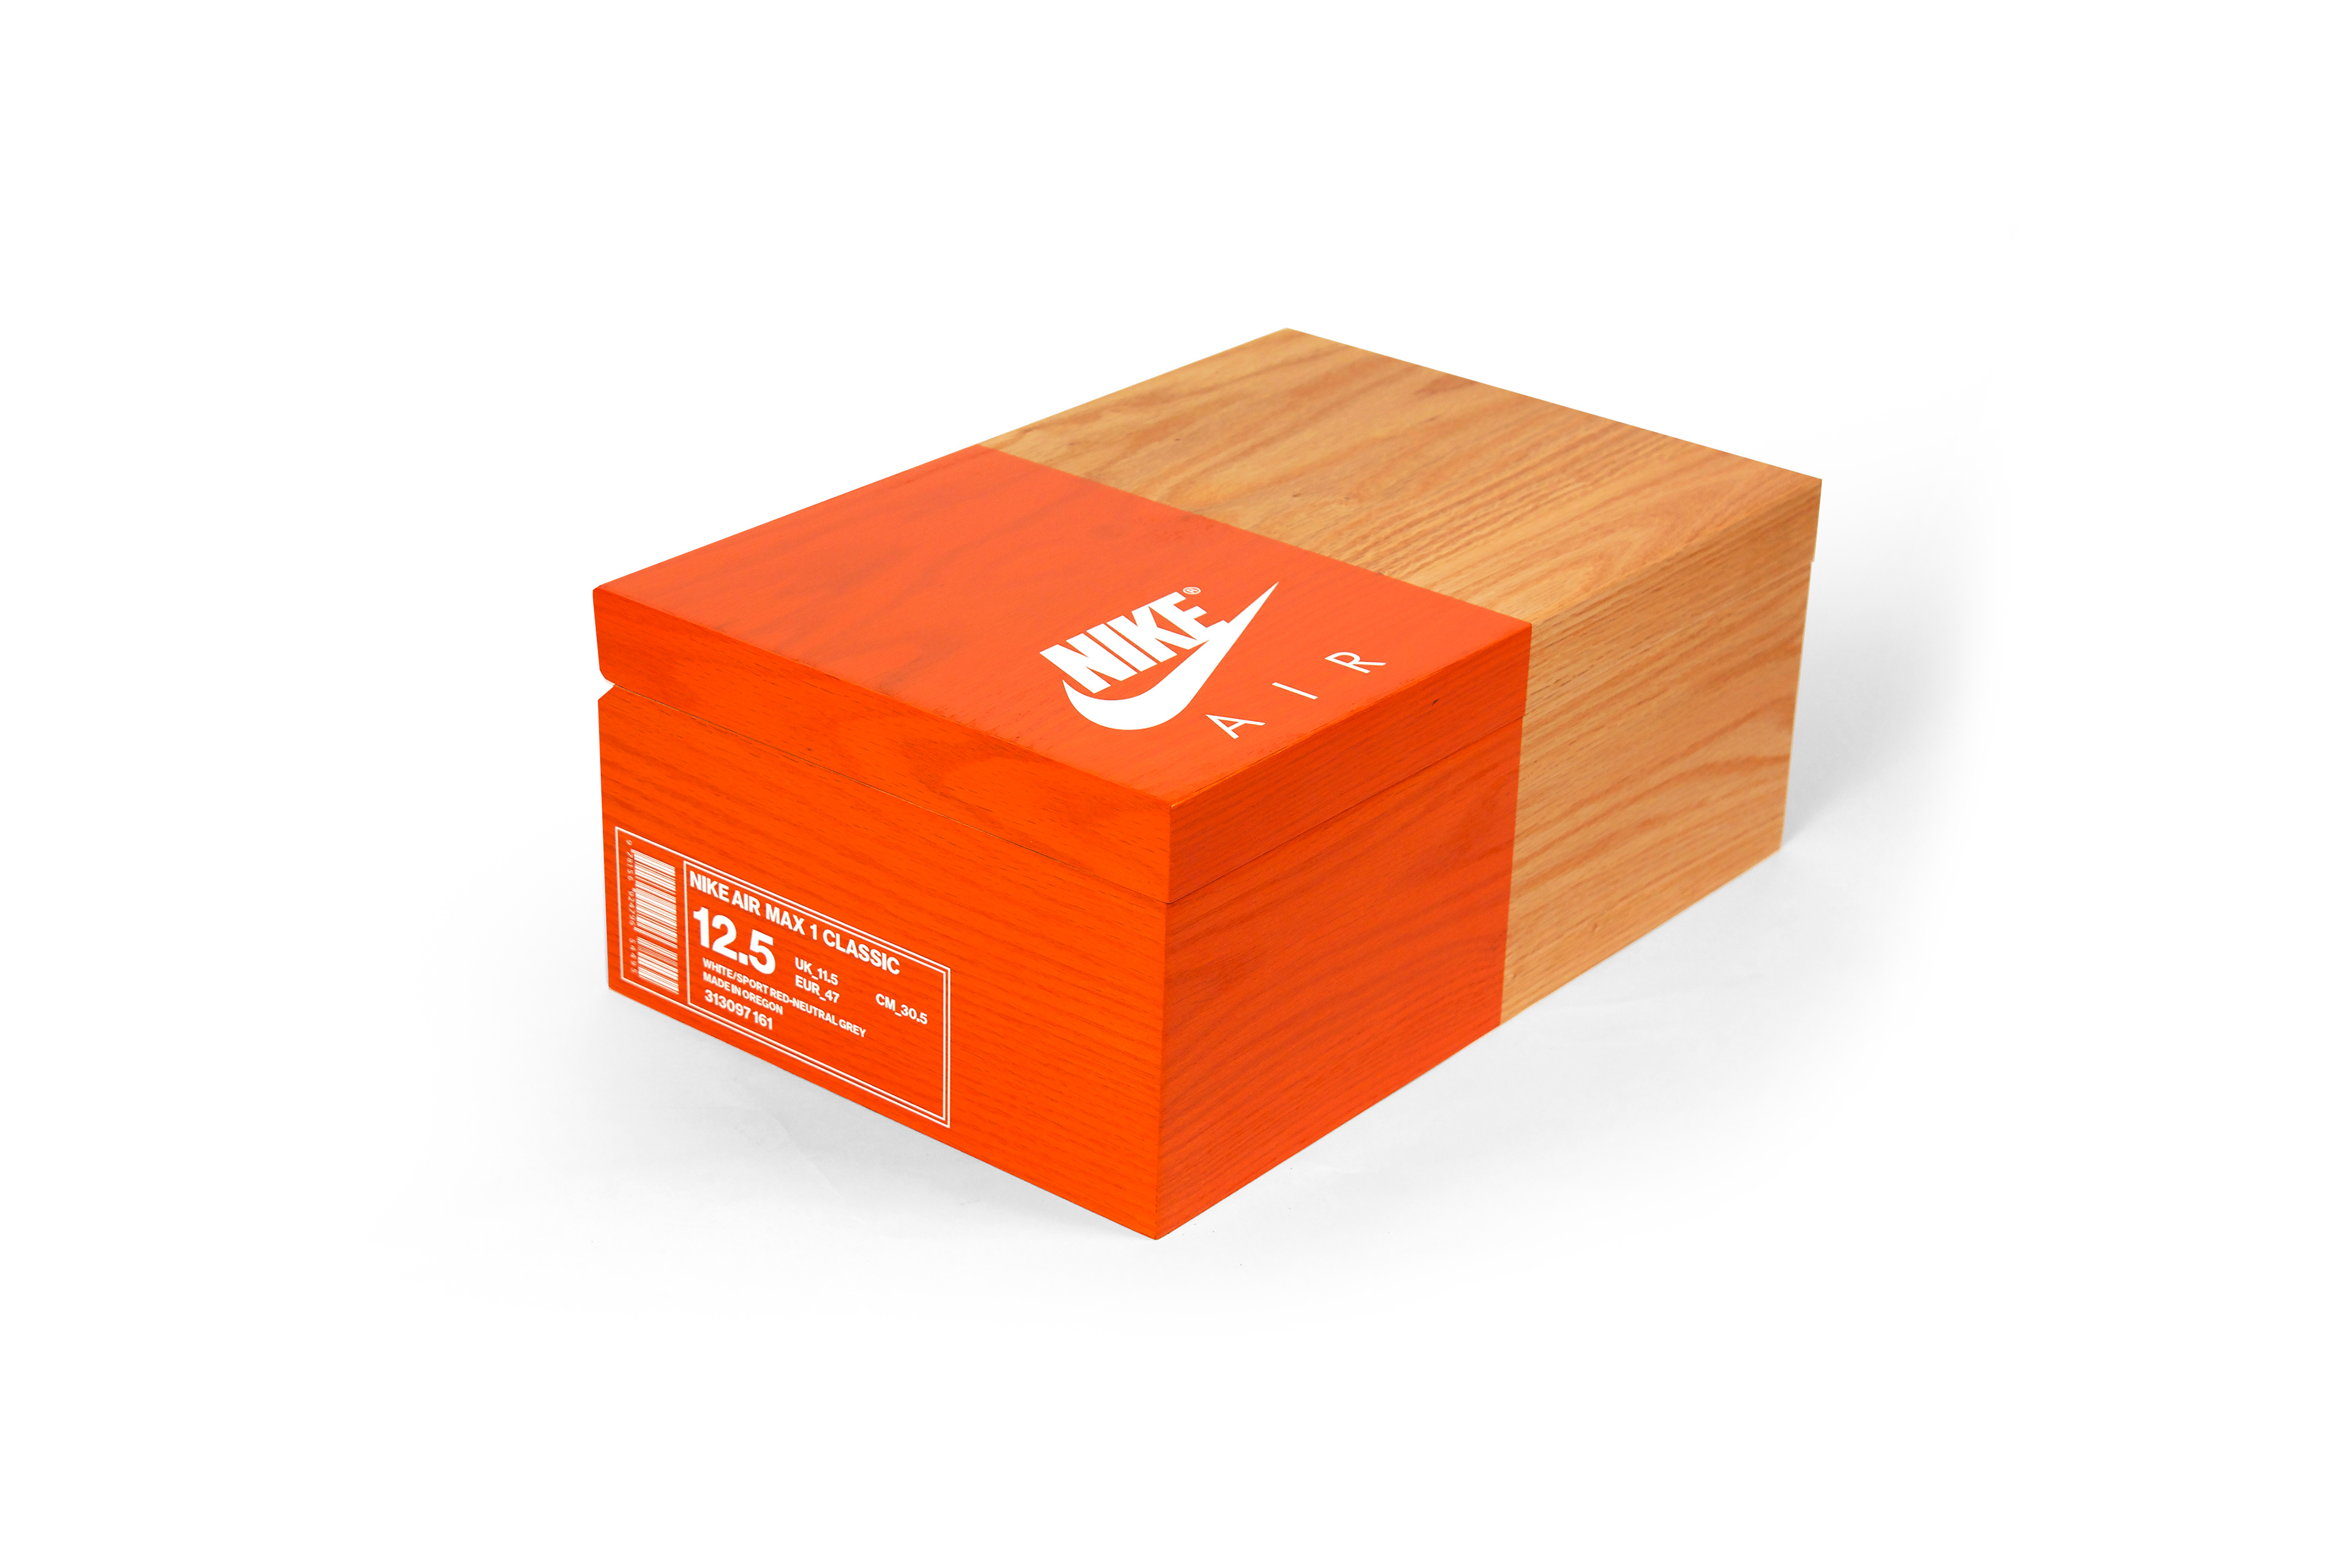 Best MAX CRIST - NIKE SHOE BOX RJ71